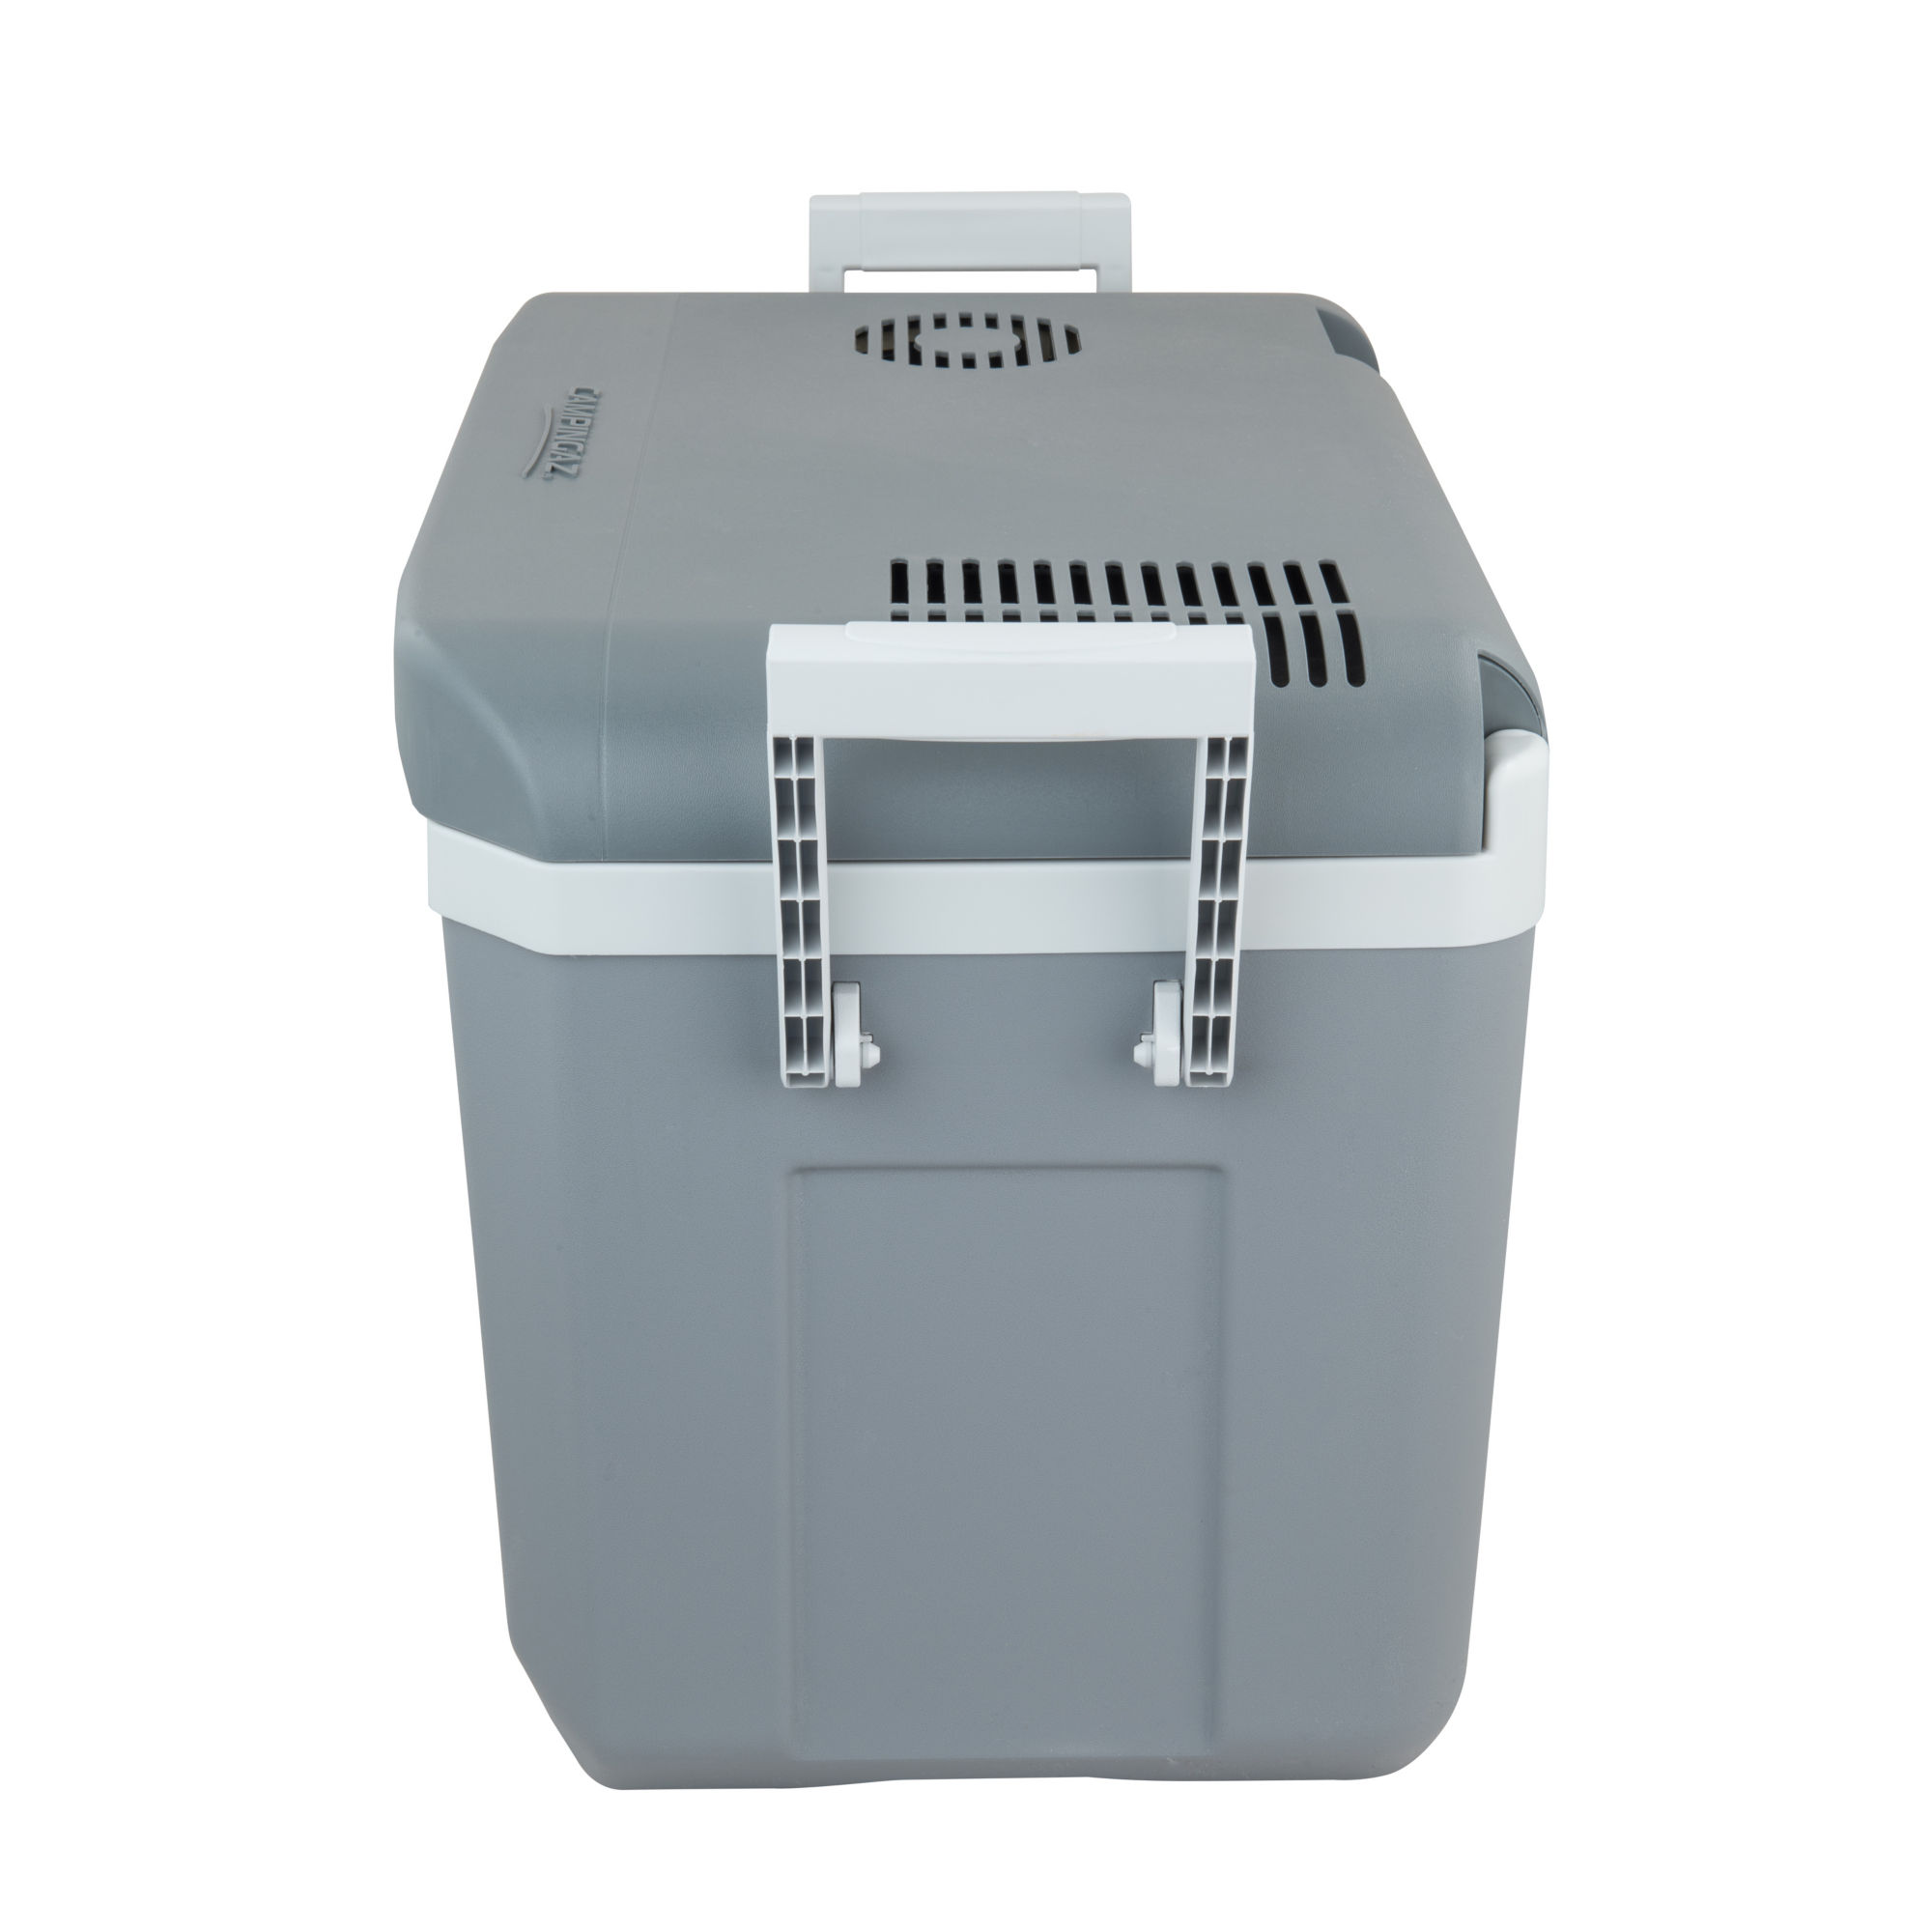 Chladící box POWERBOX PLUS 36l 12V